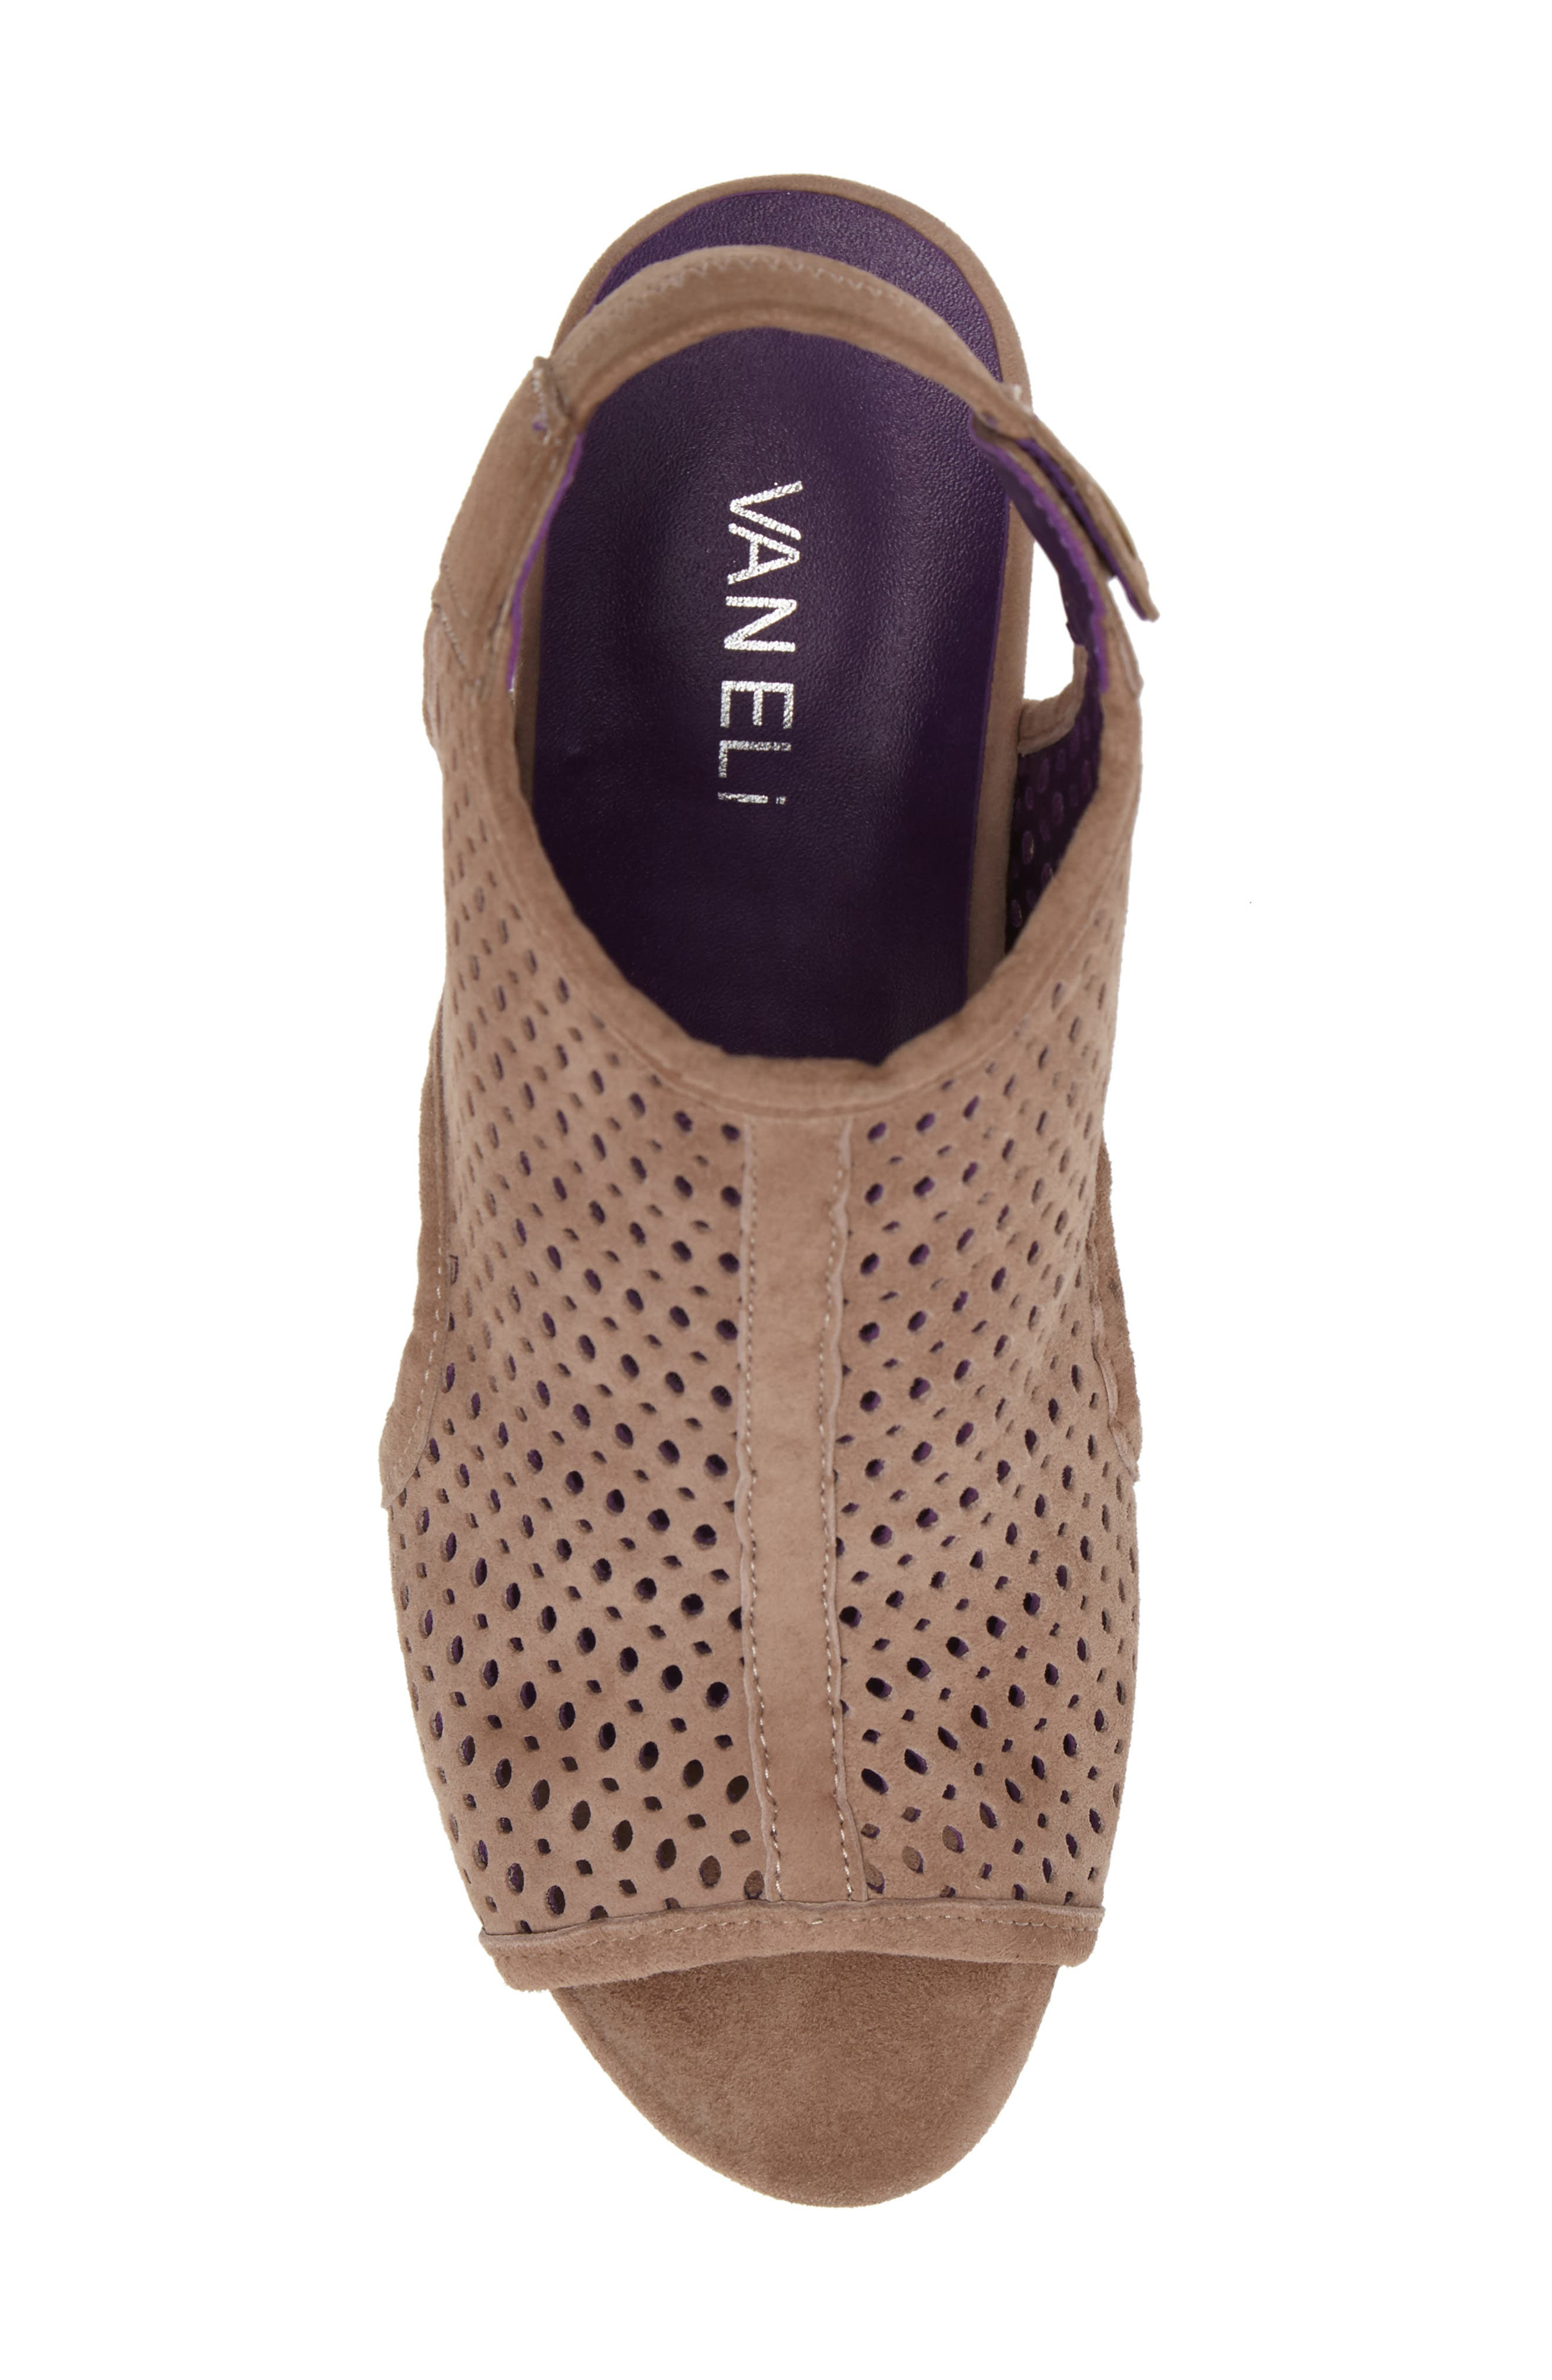 'Inez' Wedge Sandal,                             Alternate thumbnail 5, color,                             Truffle Suede